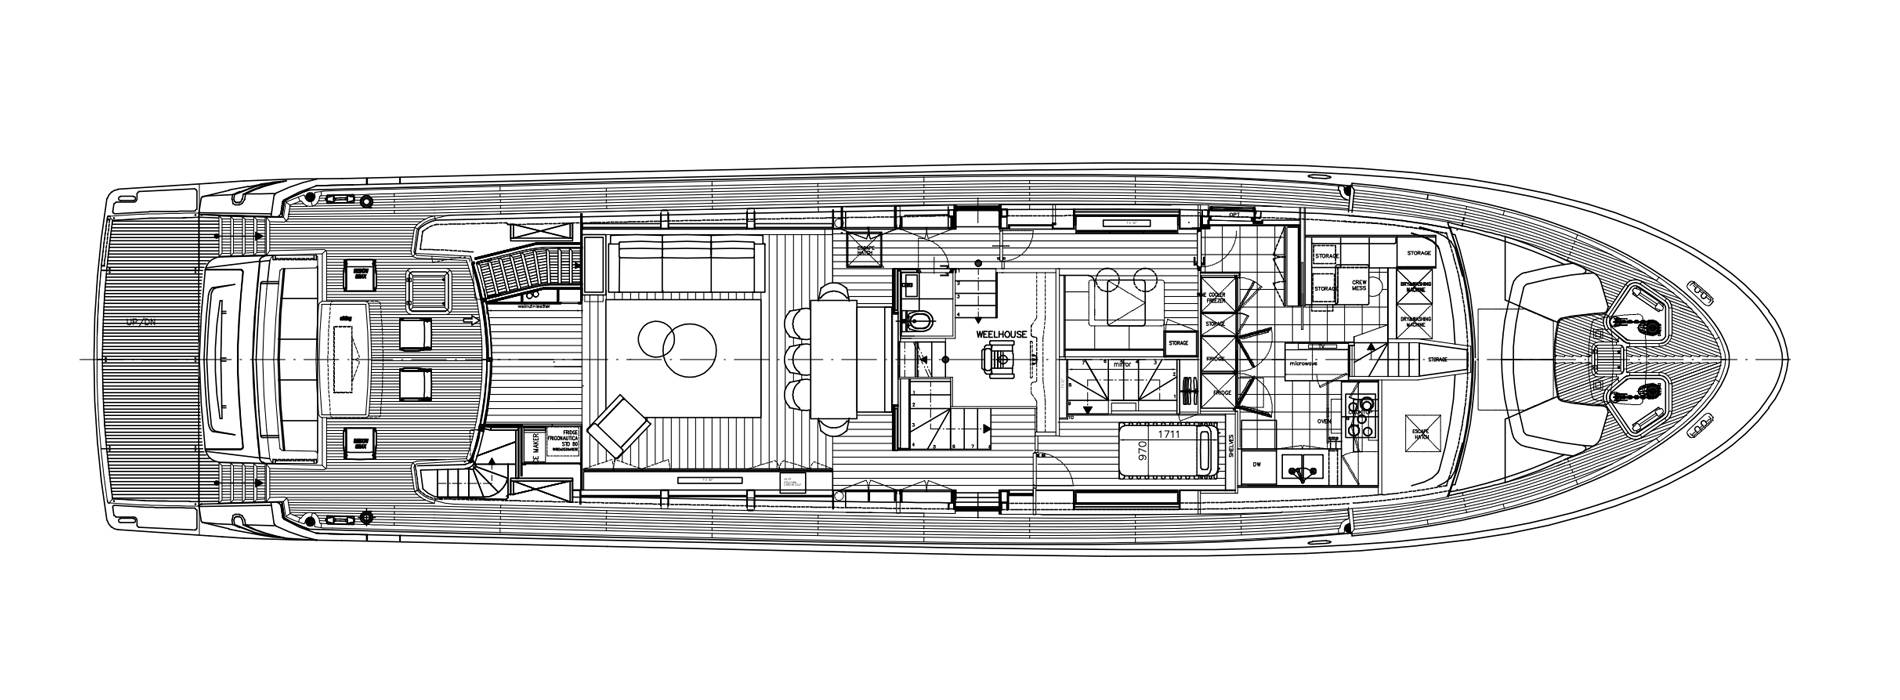 Sanlorenzo Yachts SL96-623 Main deck